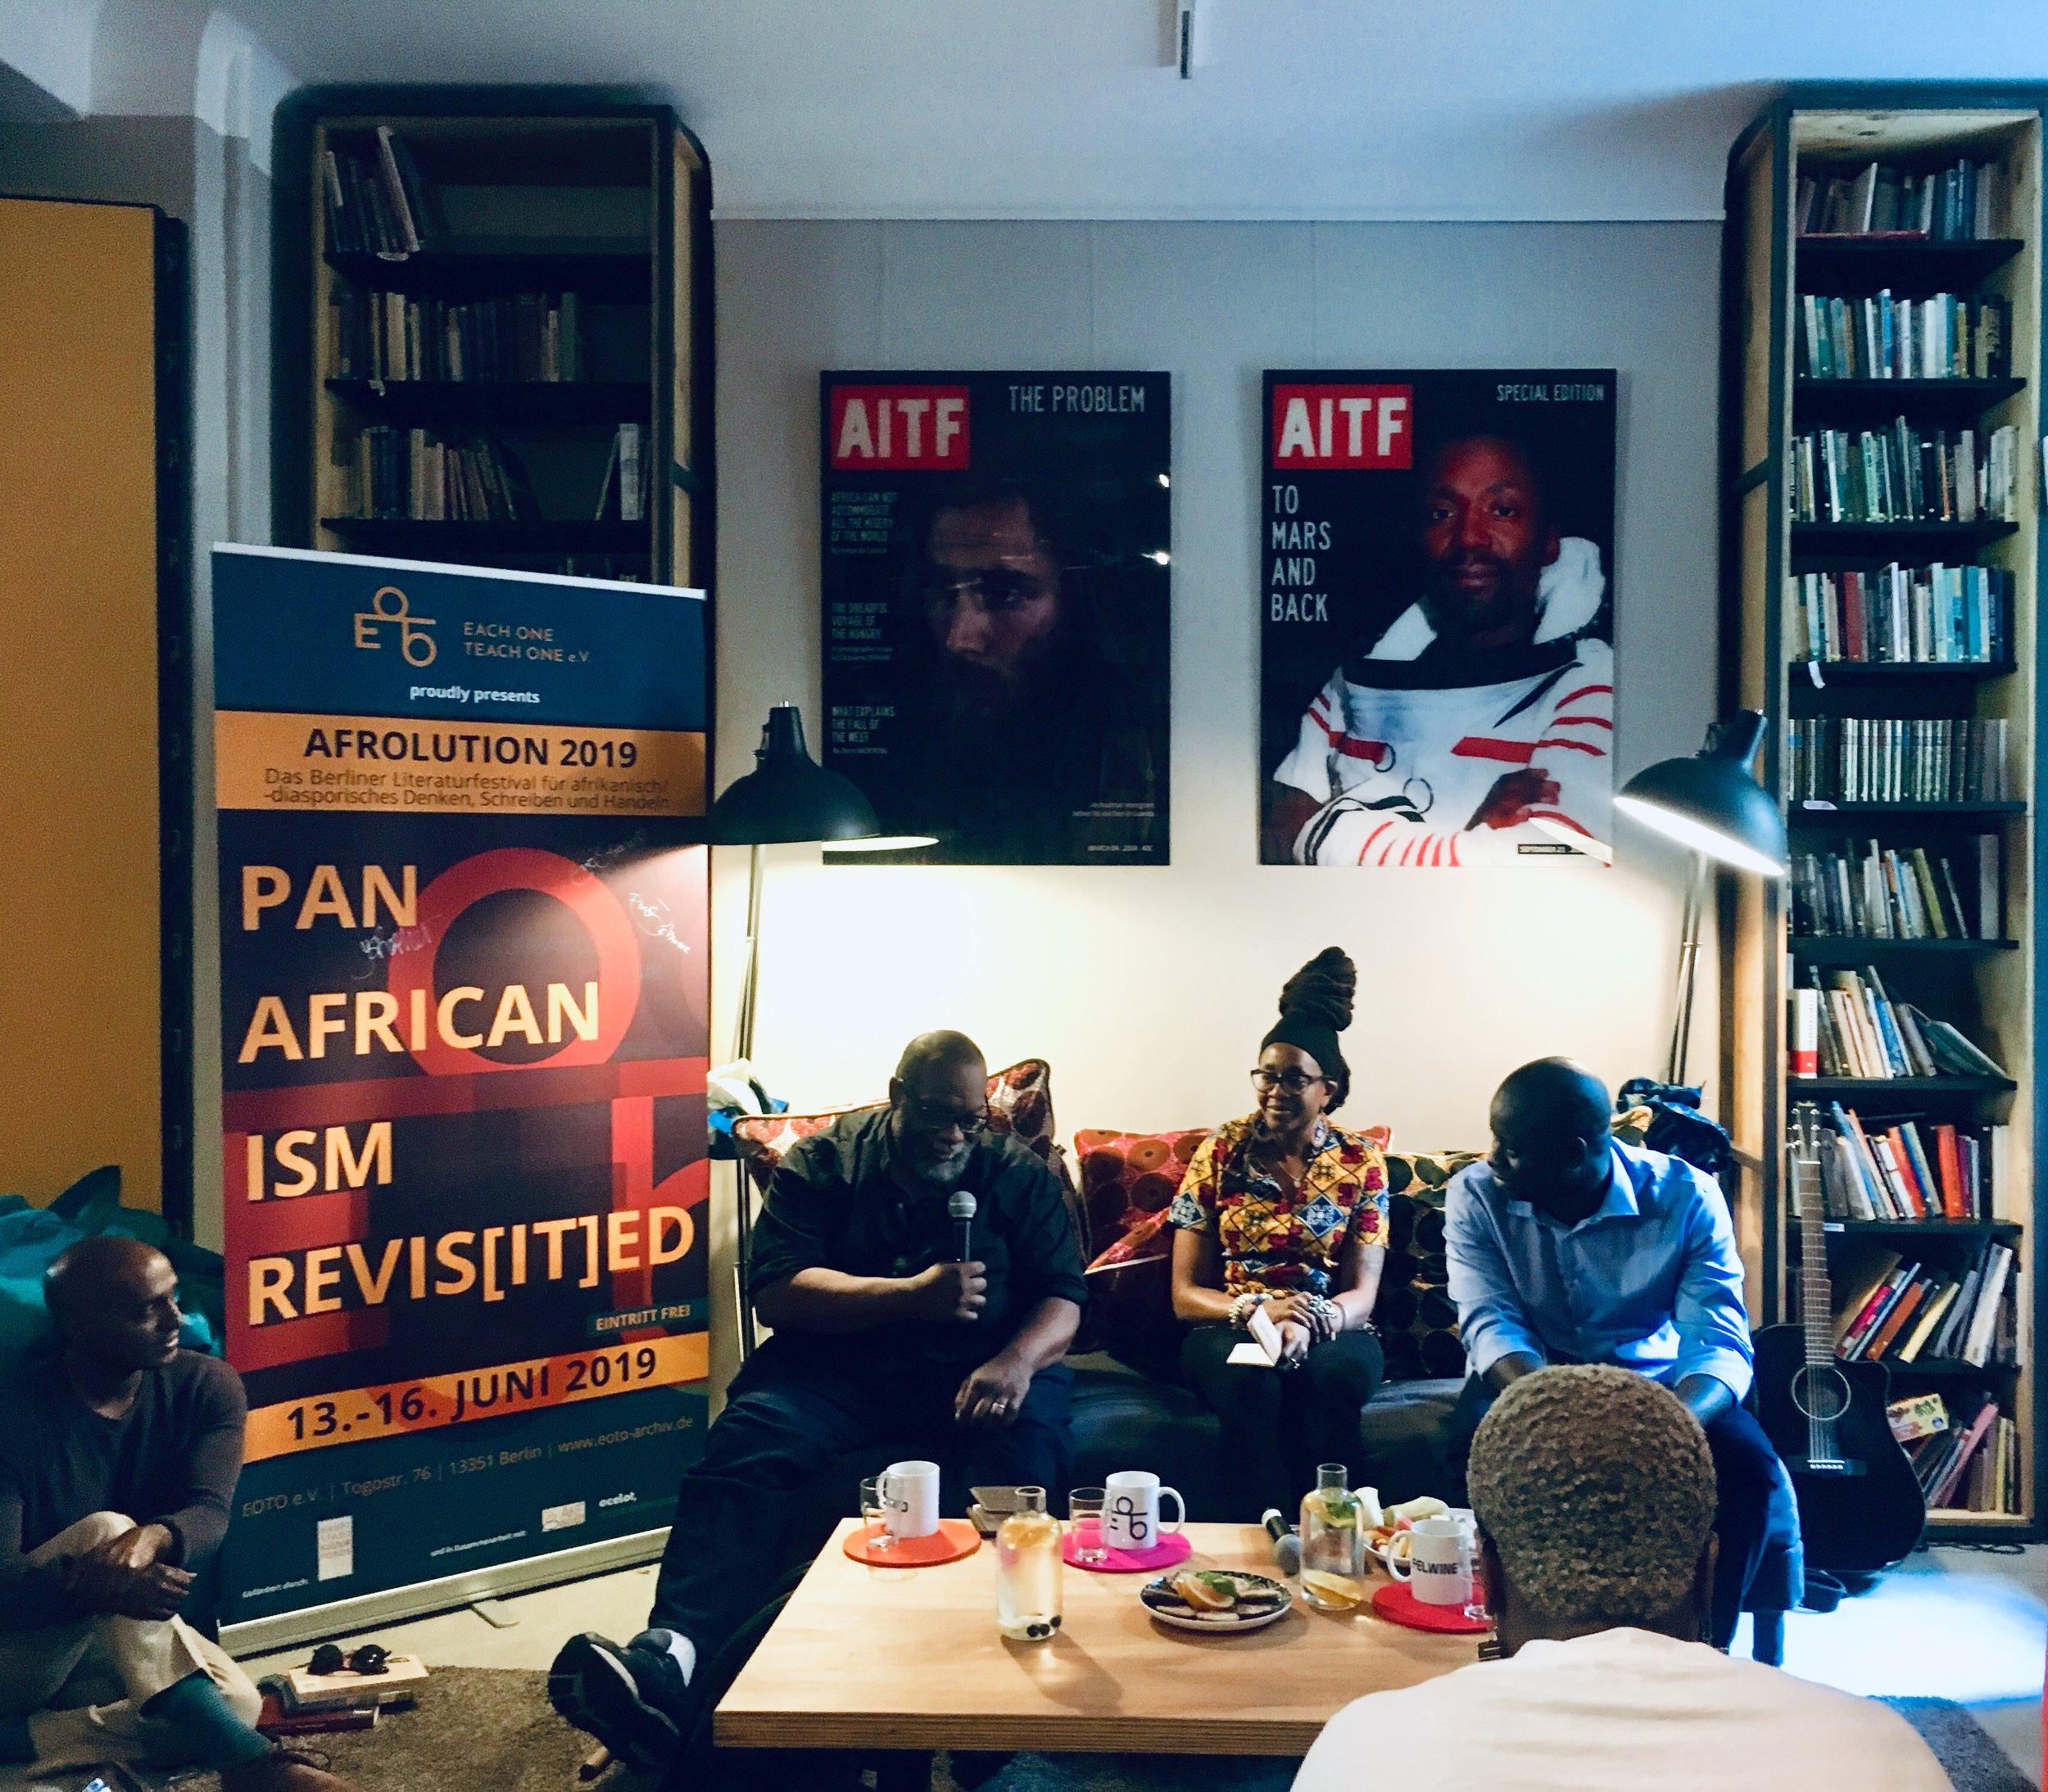 Fred Moten, Nnedi Okorafo, and Felwine Sarr at EOTO, 15 June 2019. Photo by E. Bonhomme.